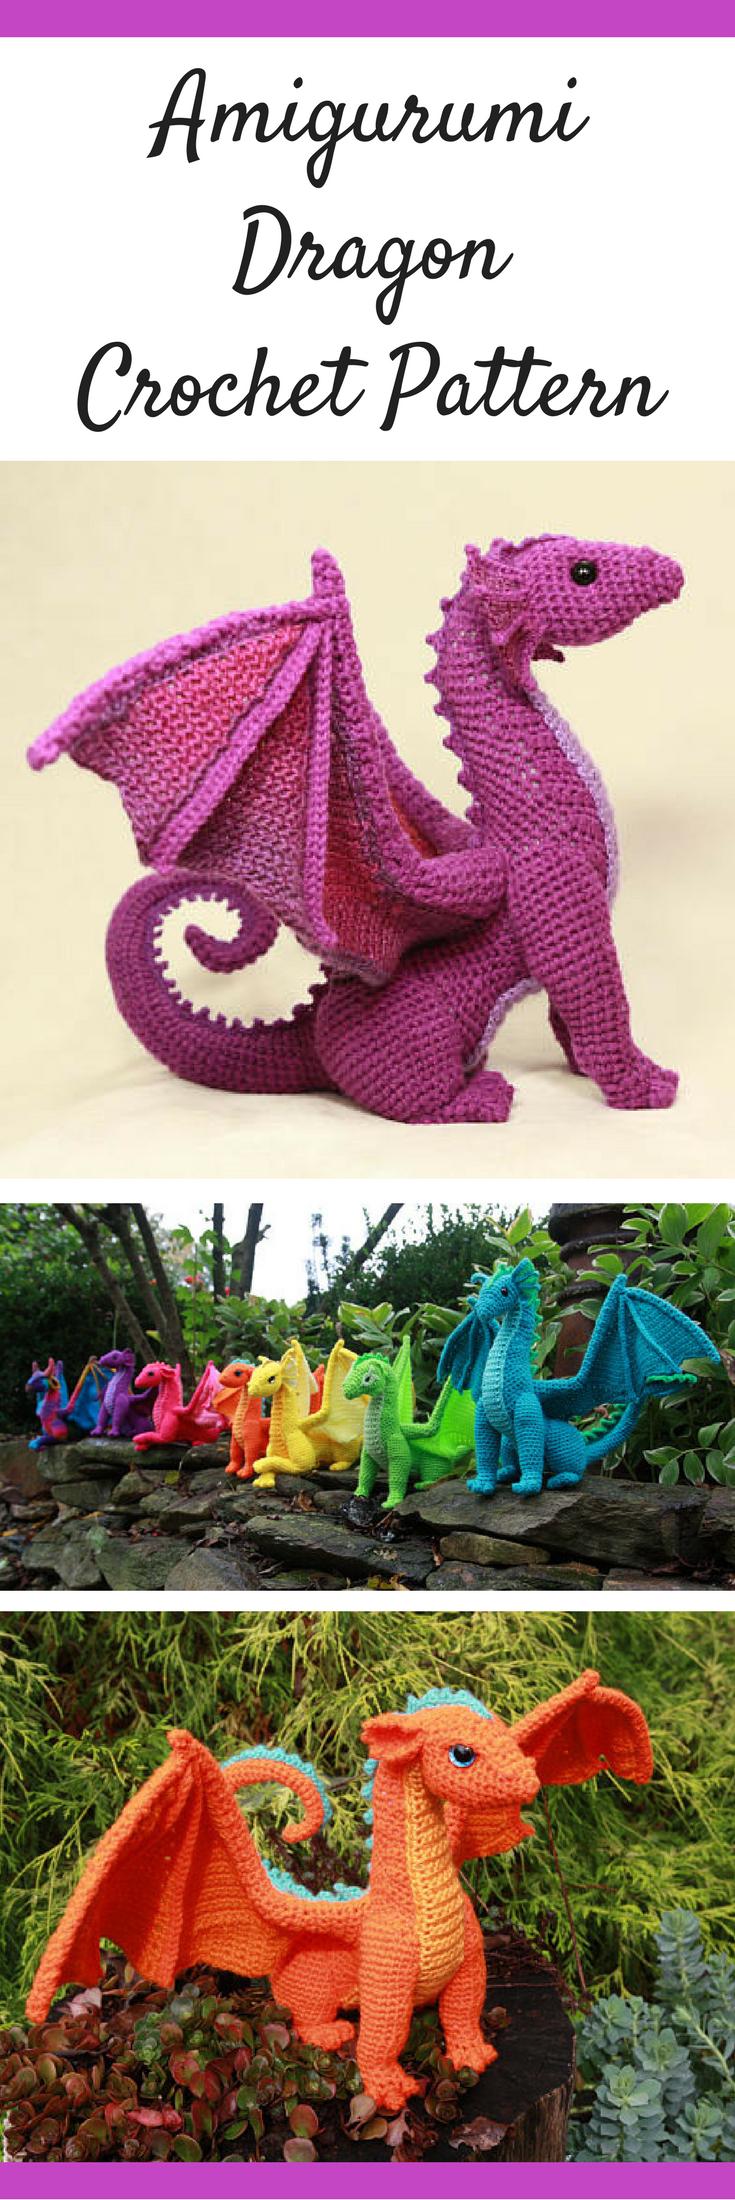 DIGITAL PDF Dragon Crochet Amigurumi Pattern | Amigurumi | Pinterest ...